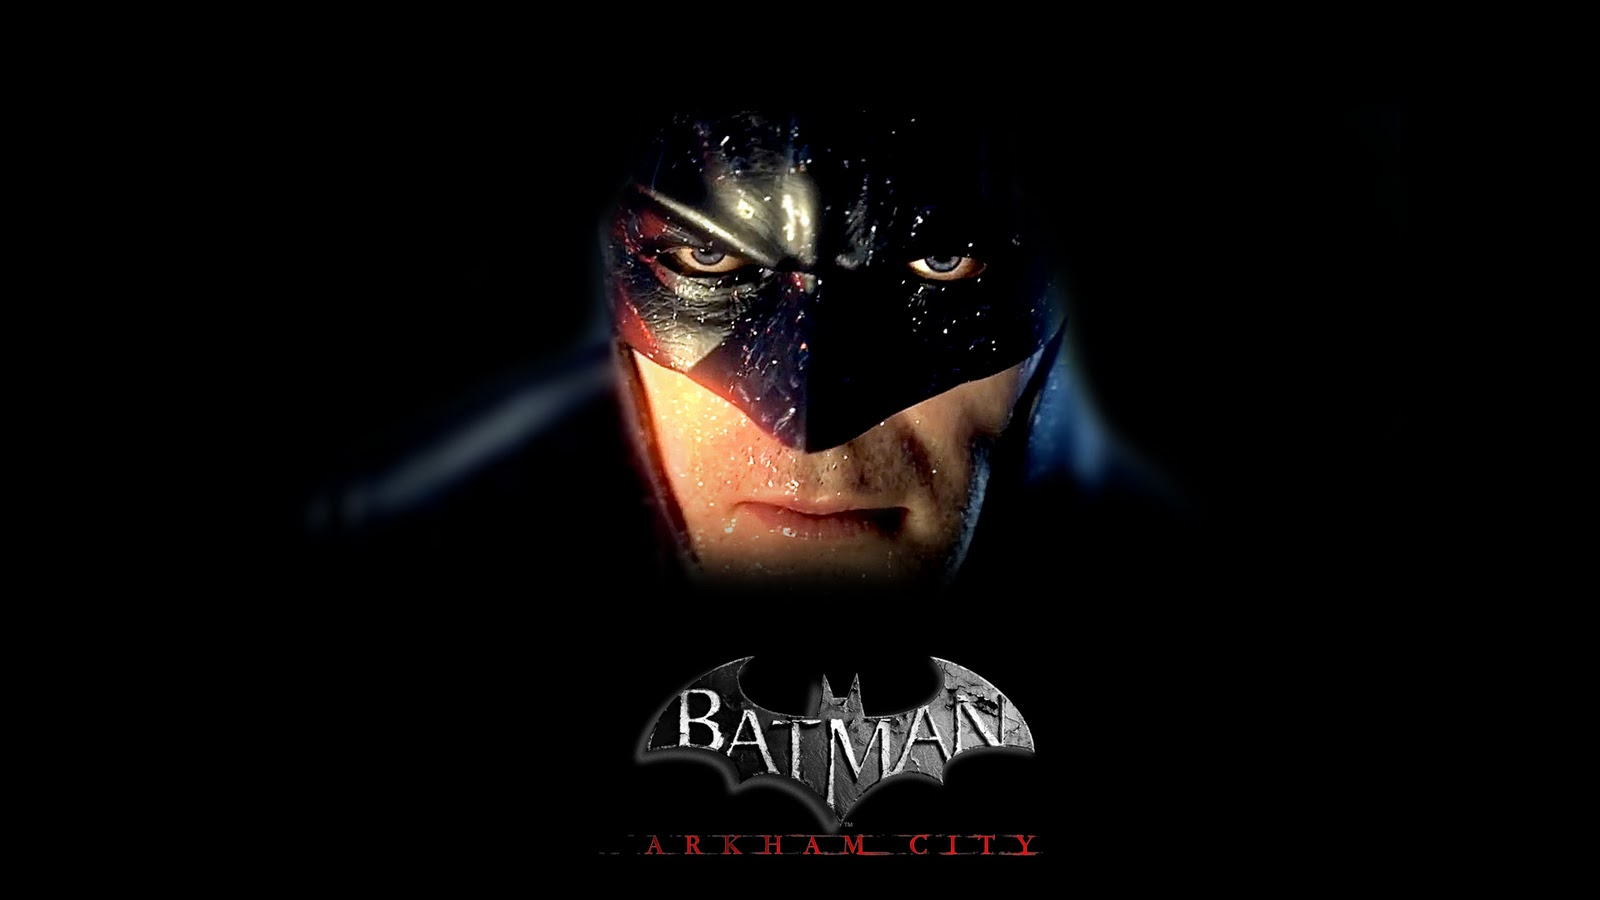 HEROOLOGYcom 1080p batman arkham city wallpaper hd 5 1600x900